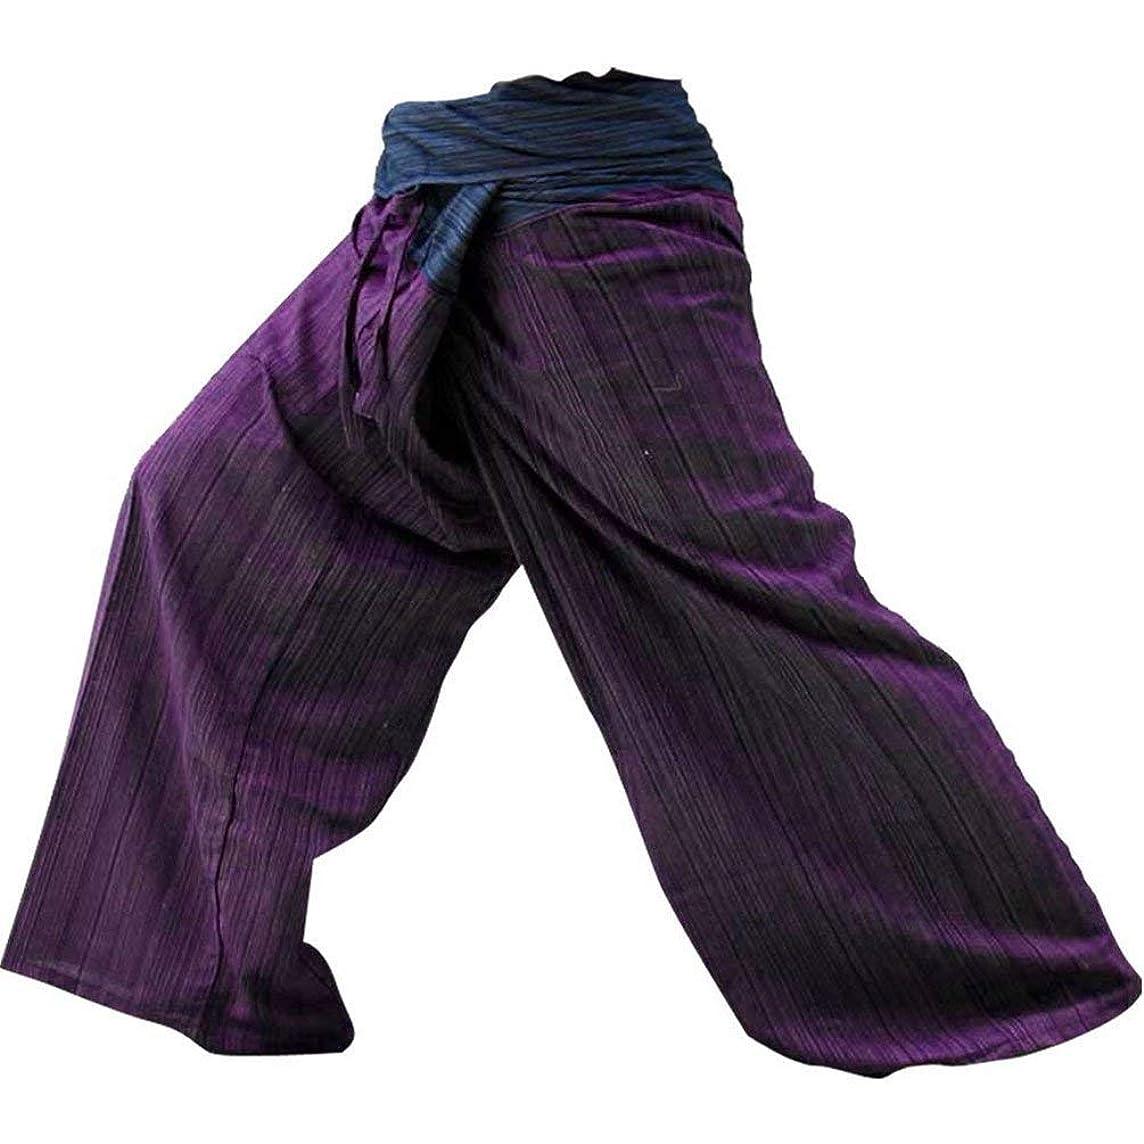 2 Tone Thai Fisherman Pants Yoga Trousers Free Size Cotton, Blue/Purple, Free Size